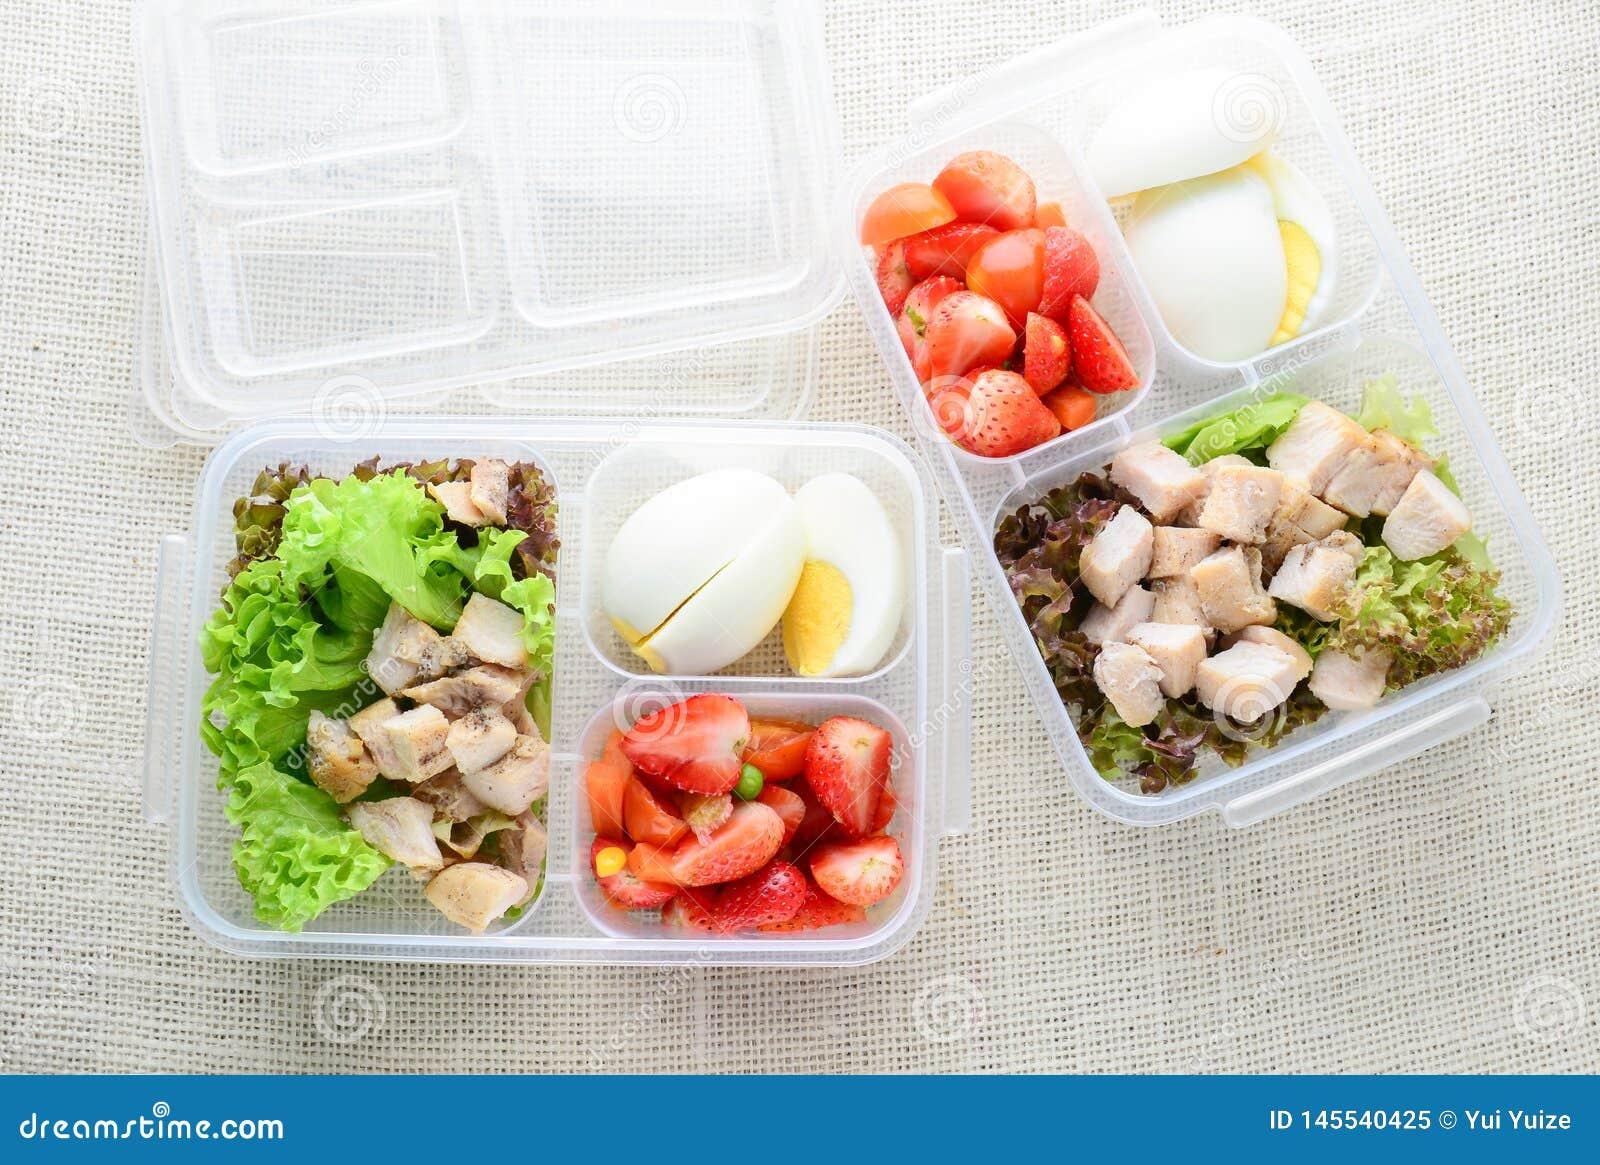 Nourritures saines et propres dans une boîte